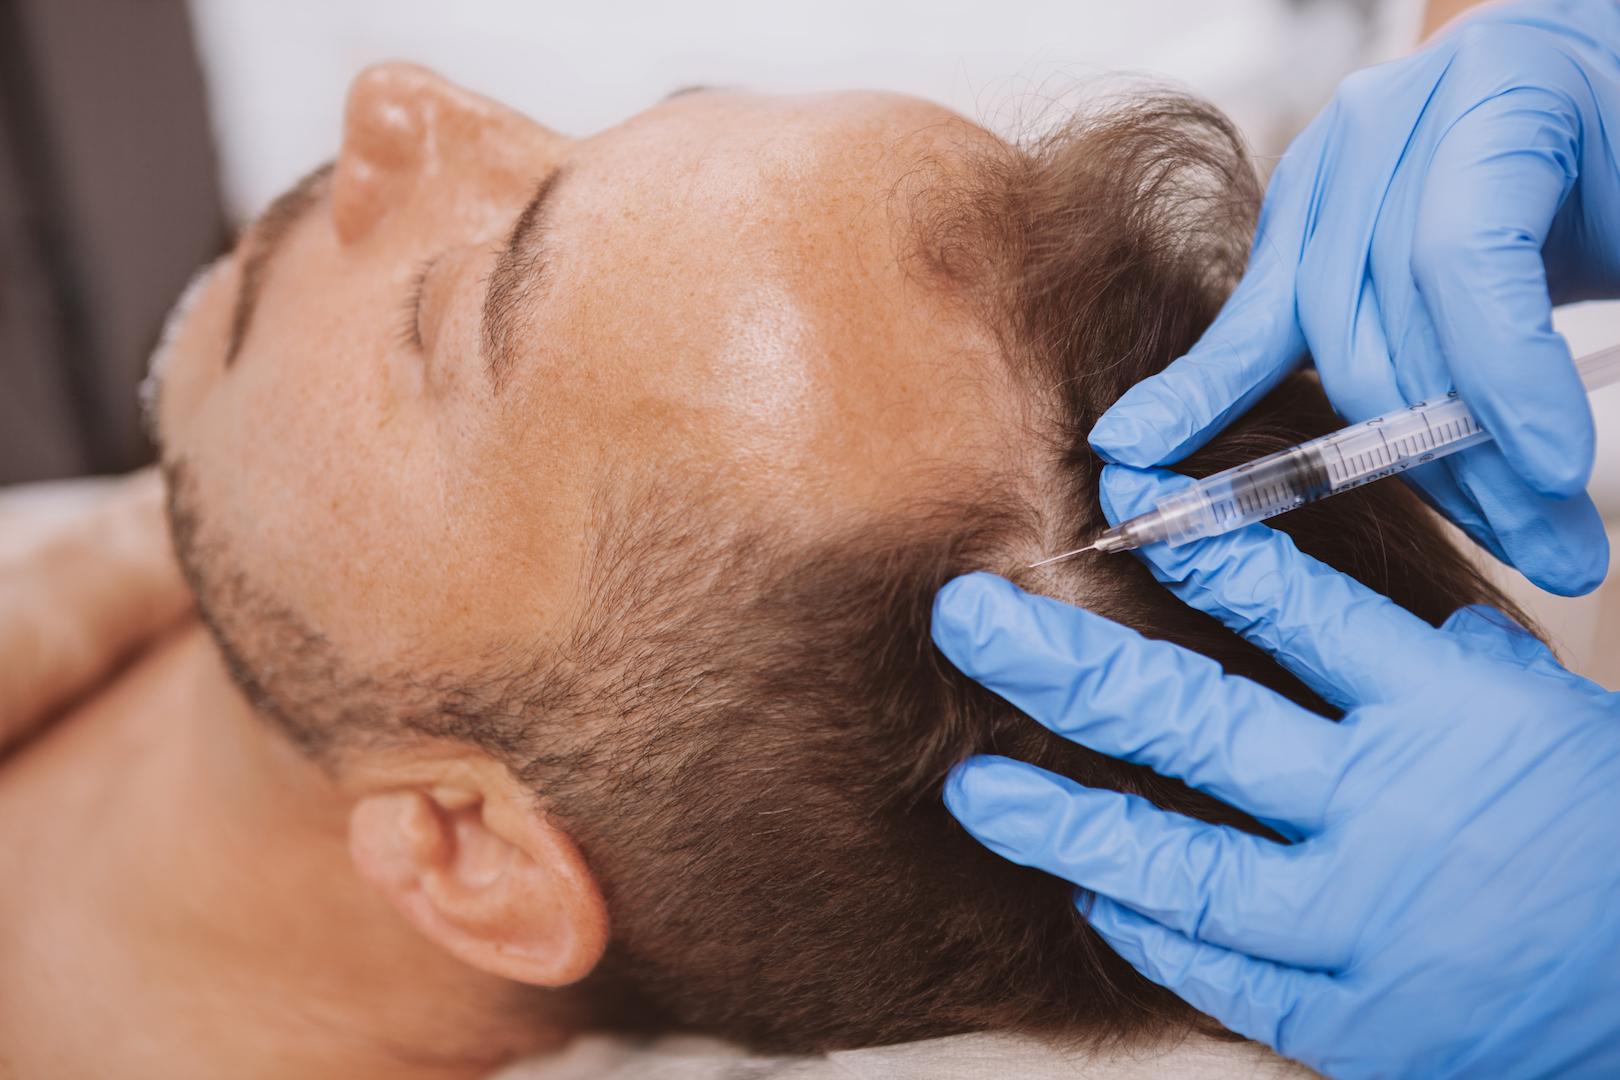 hair-loss-torrance-hair-restoration-treatment-near-me